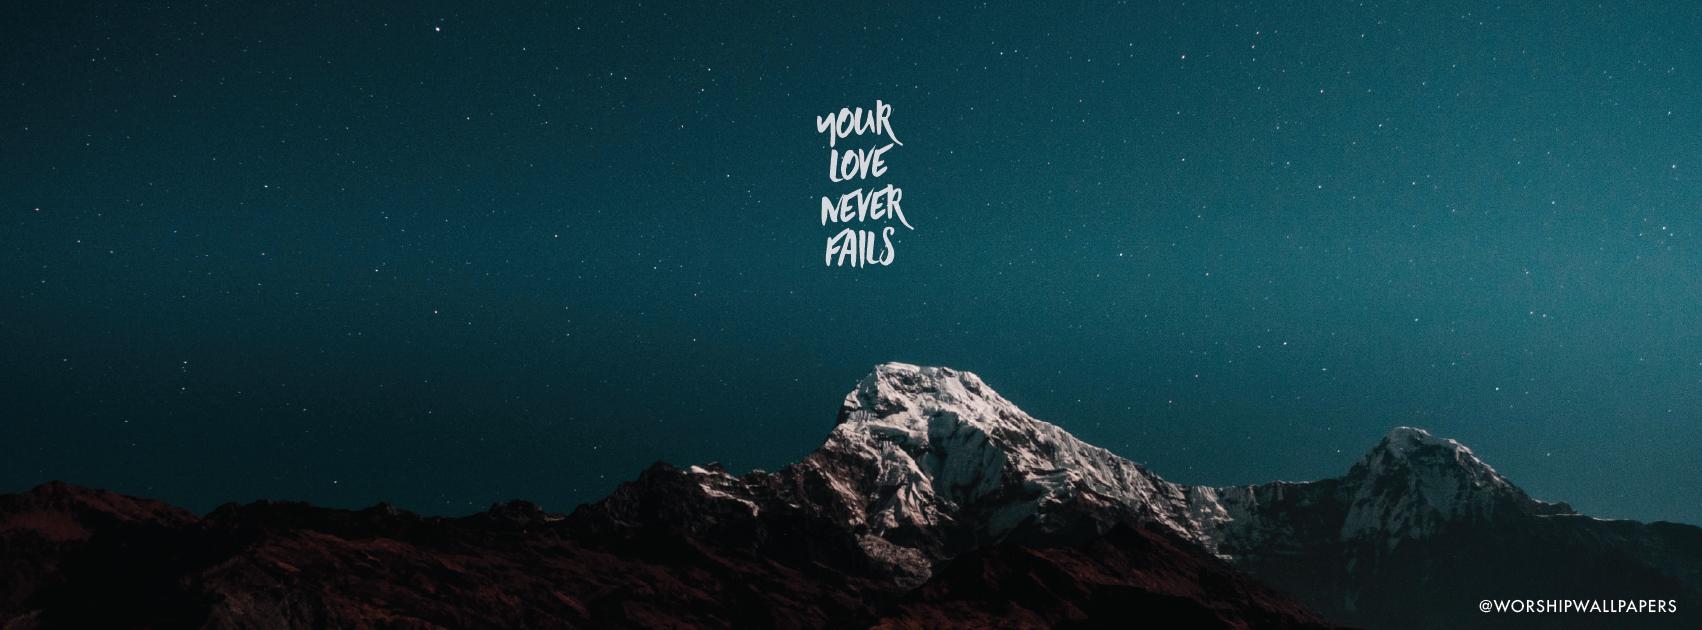 your love never fails lyrics pdf